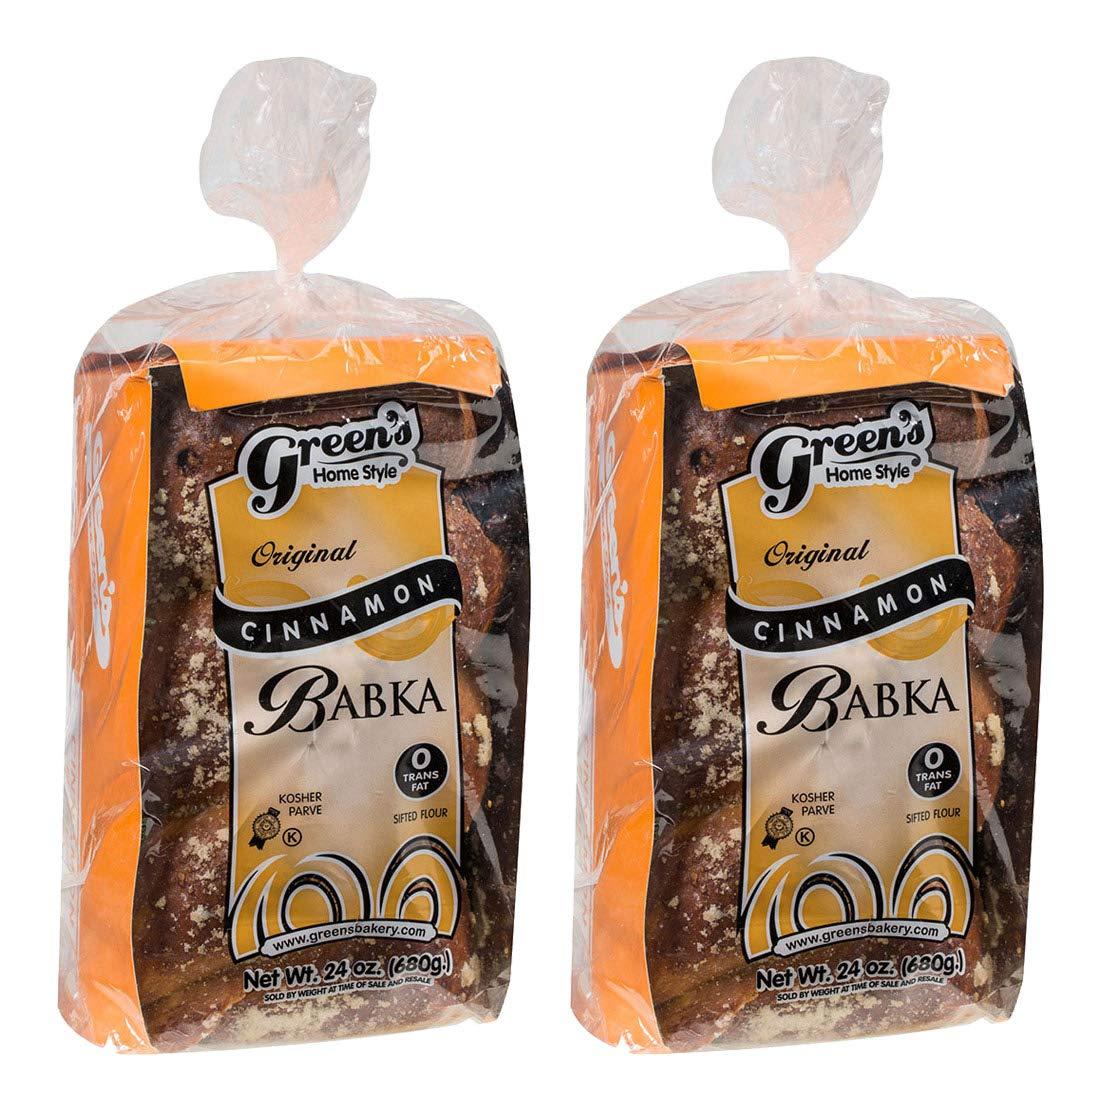 Green's Bakery Traditional Kosher Cinnamon Babka, 24 oz - 2 Pack by Green's (Image #1)